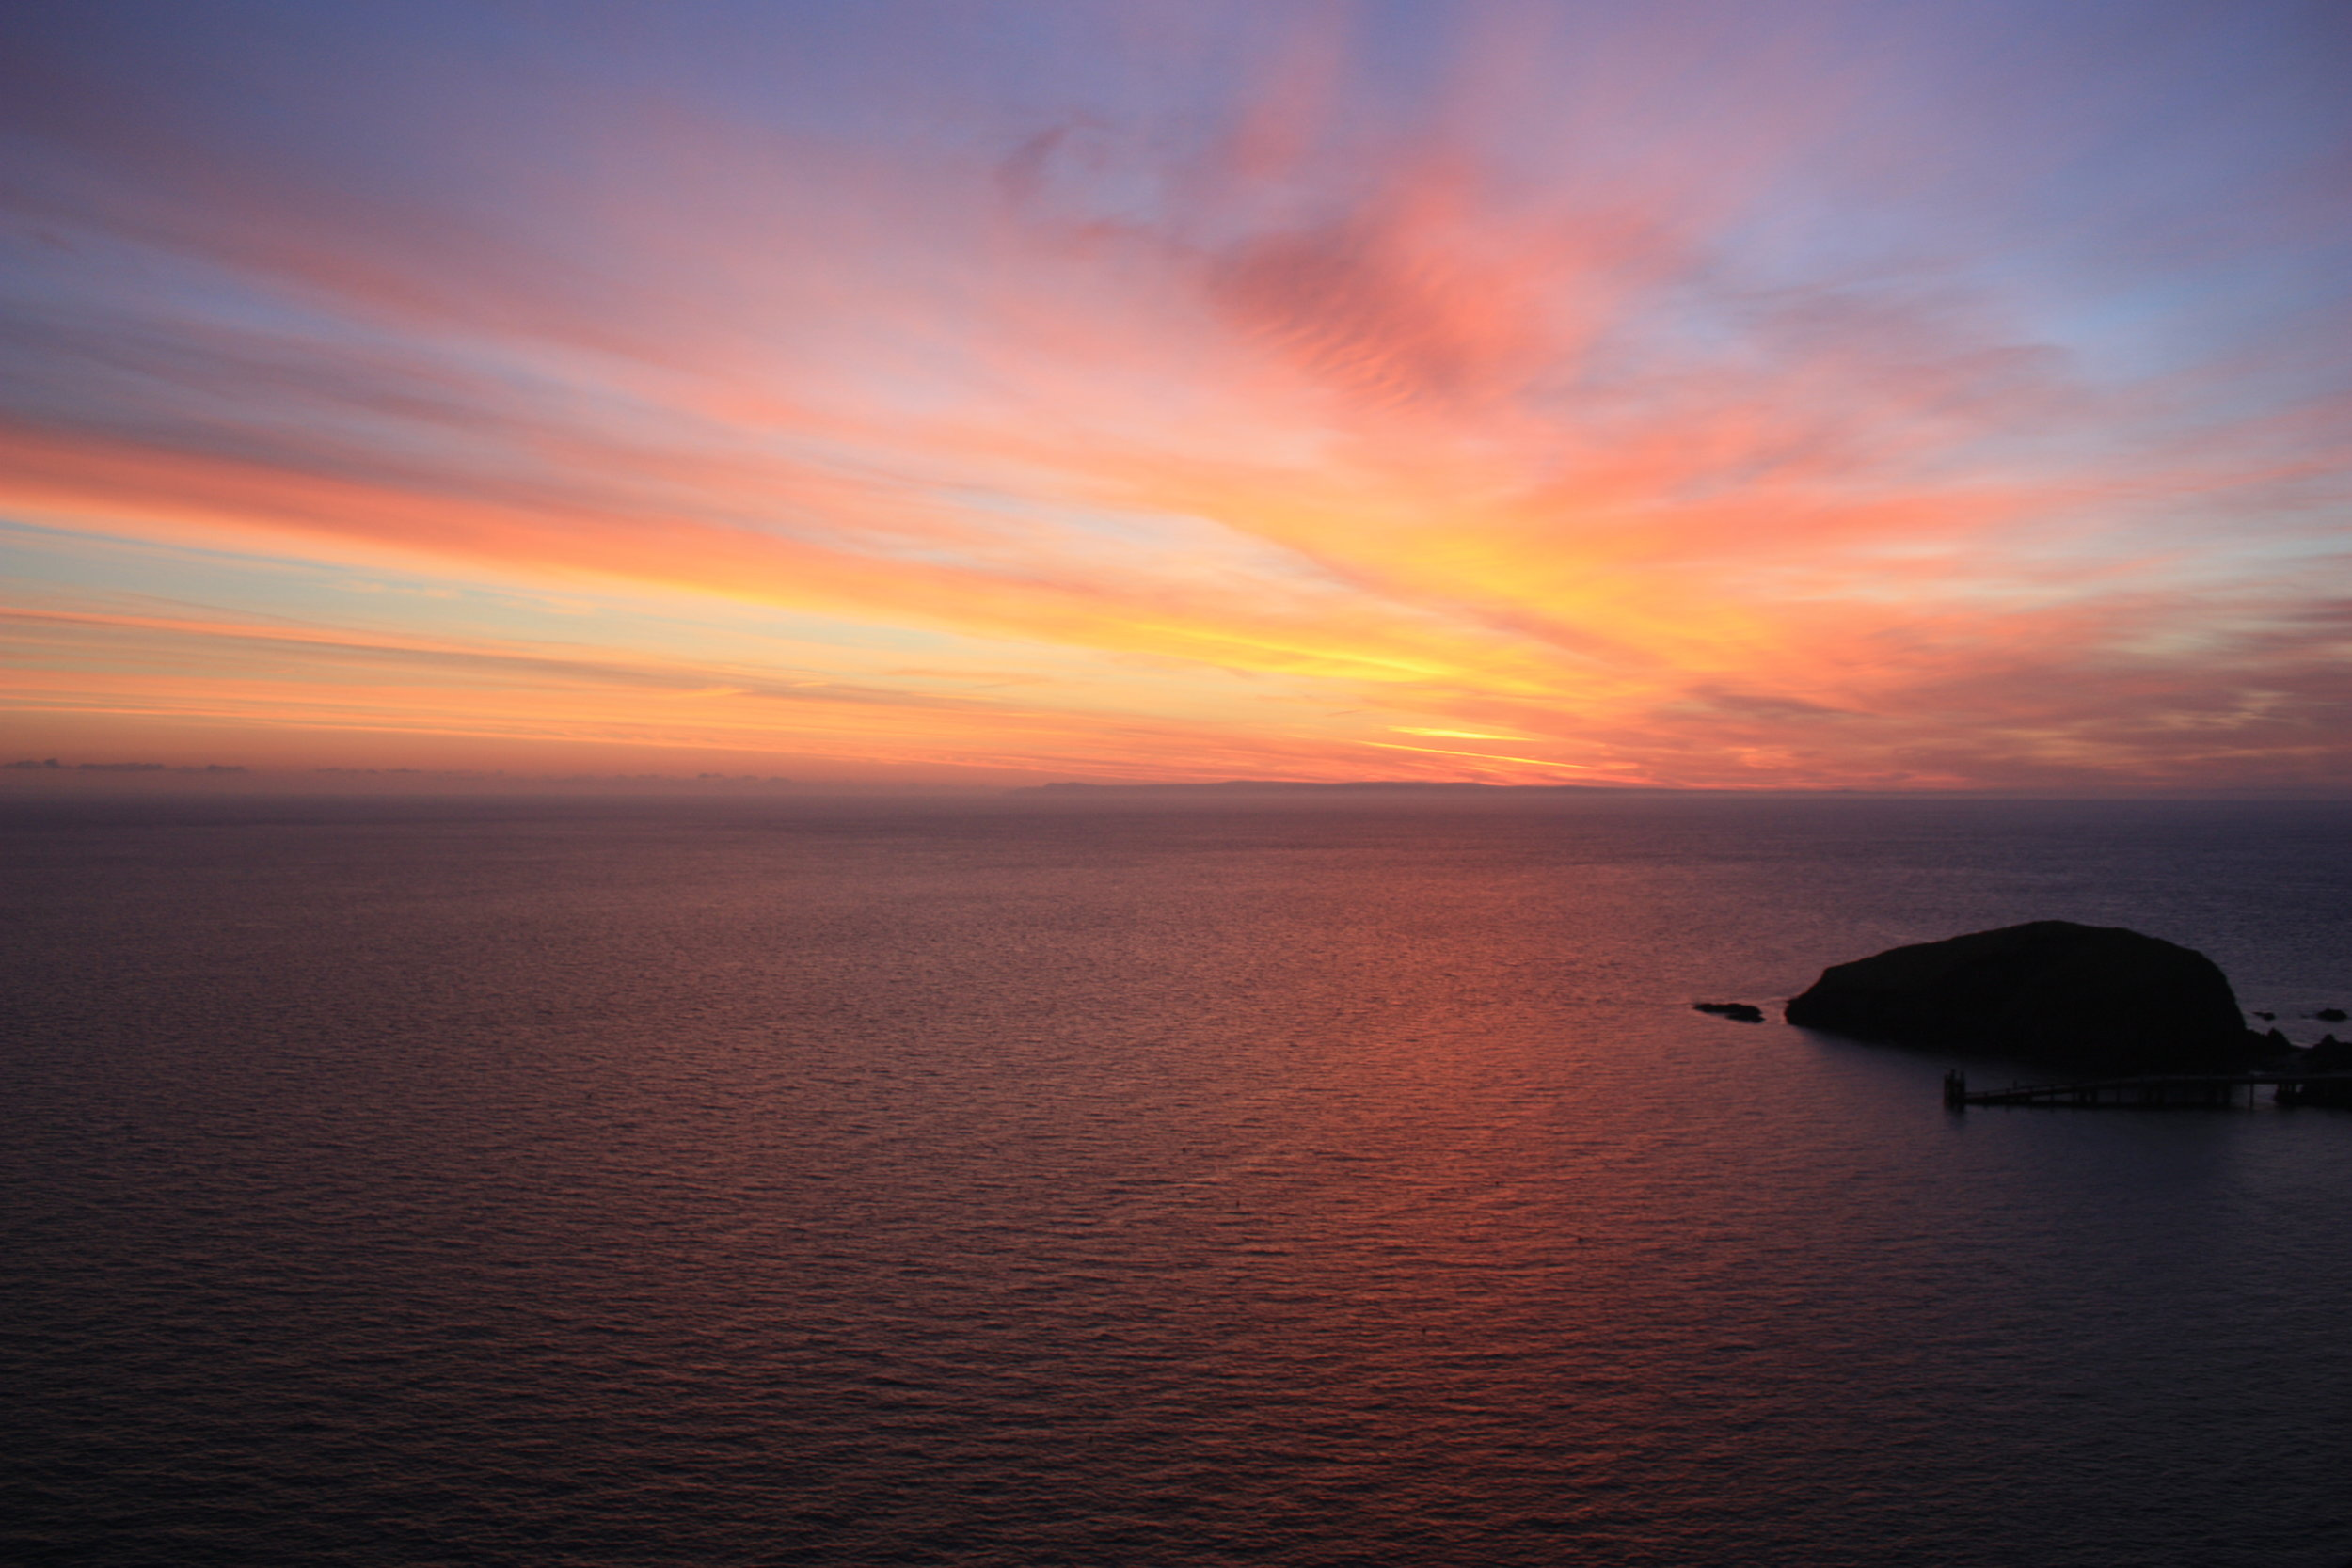 sea-dawn-sunset-cloudy.jpg